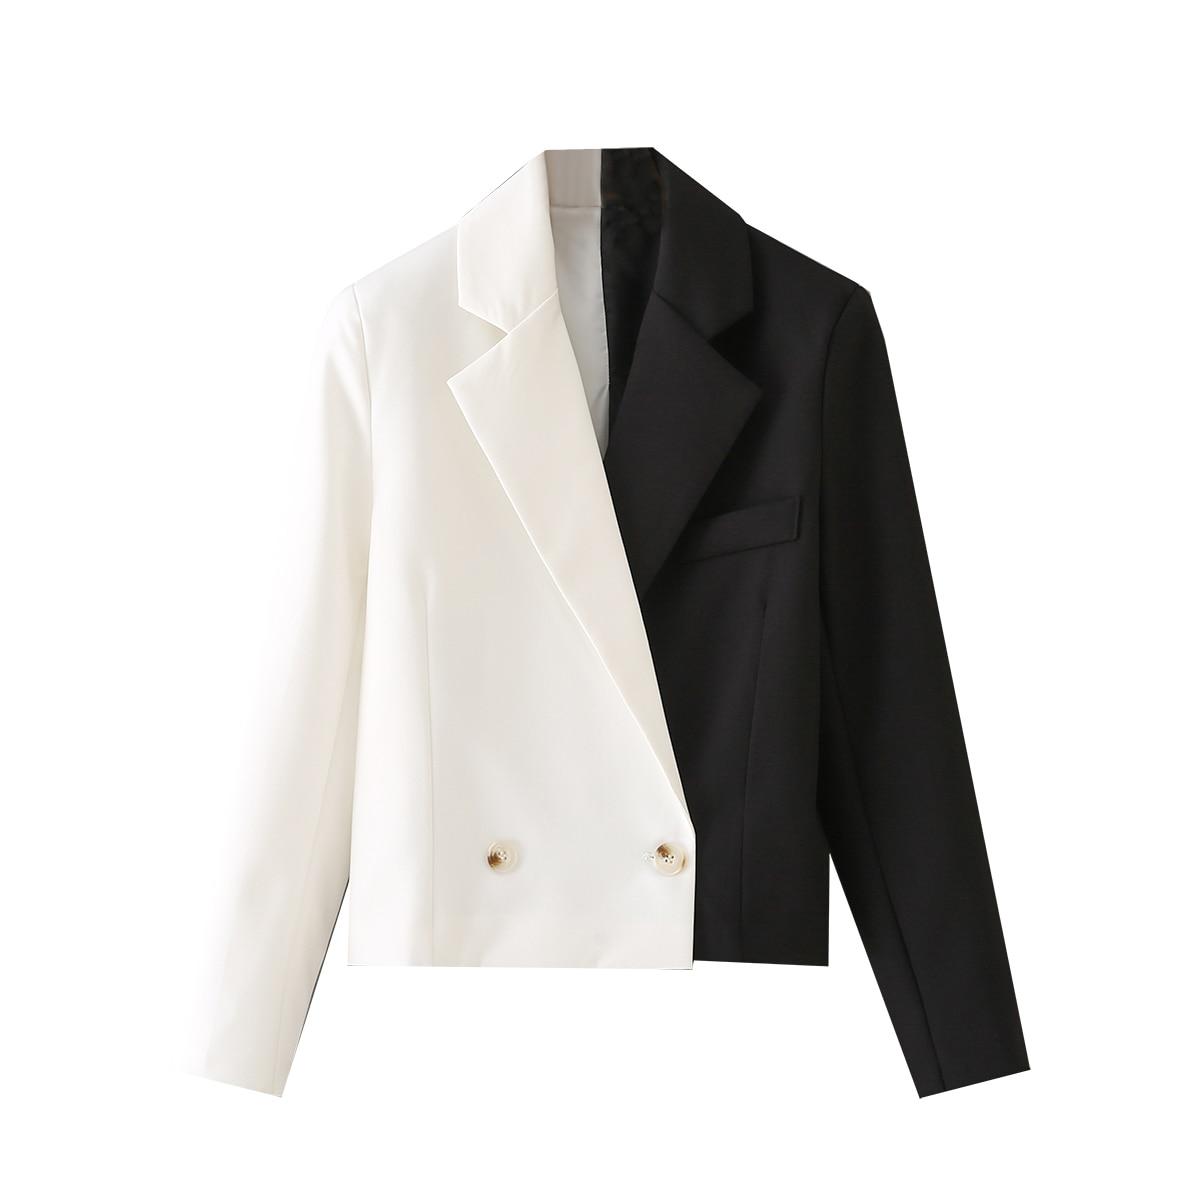 BLSQR التباين اللون بليزر المرأة مزدوجة الصدر موضة المحاصيل السترة معطف سيدة 2021 خمر شيك سترات رجالي فتاة